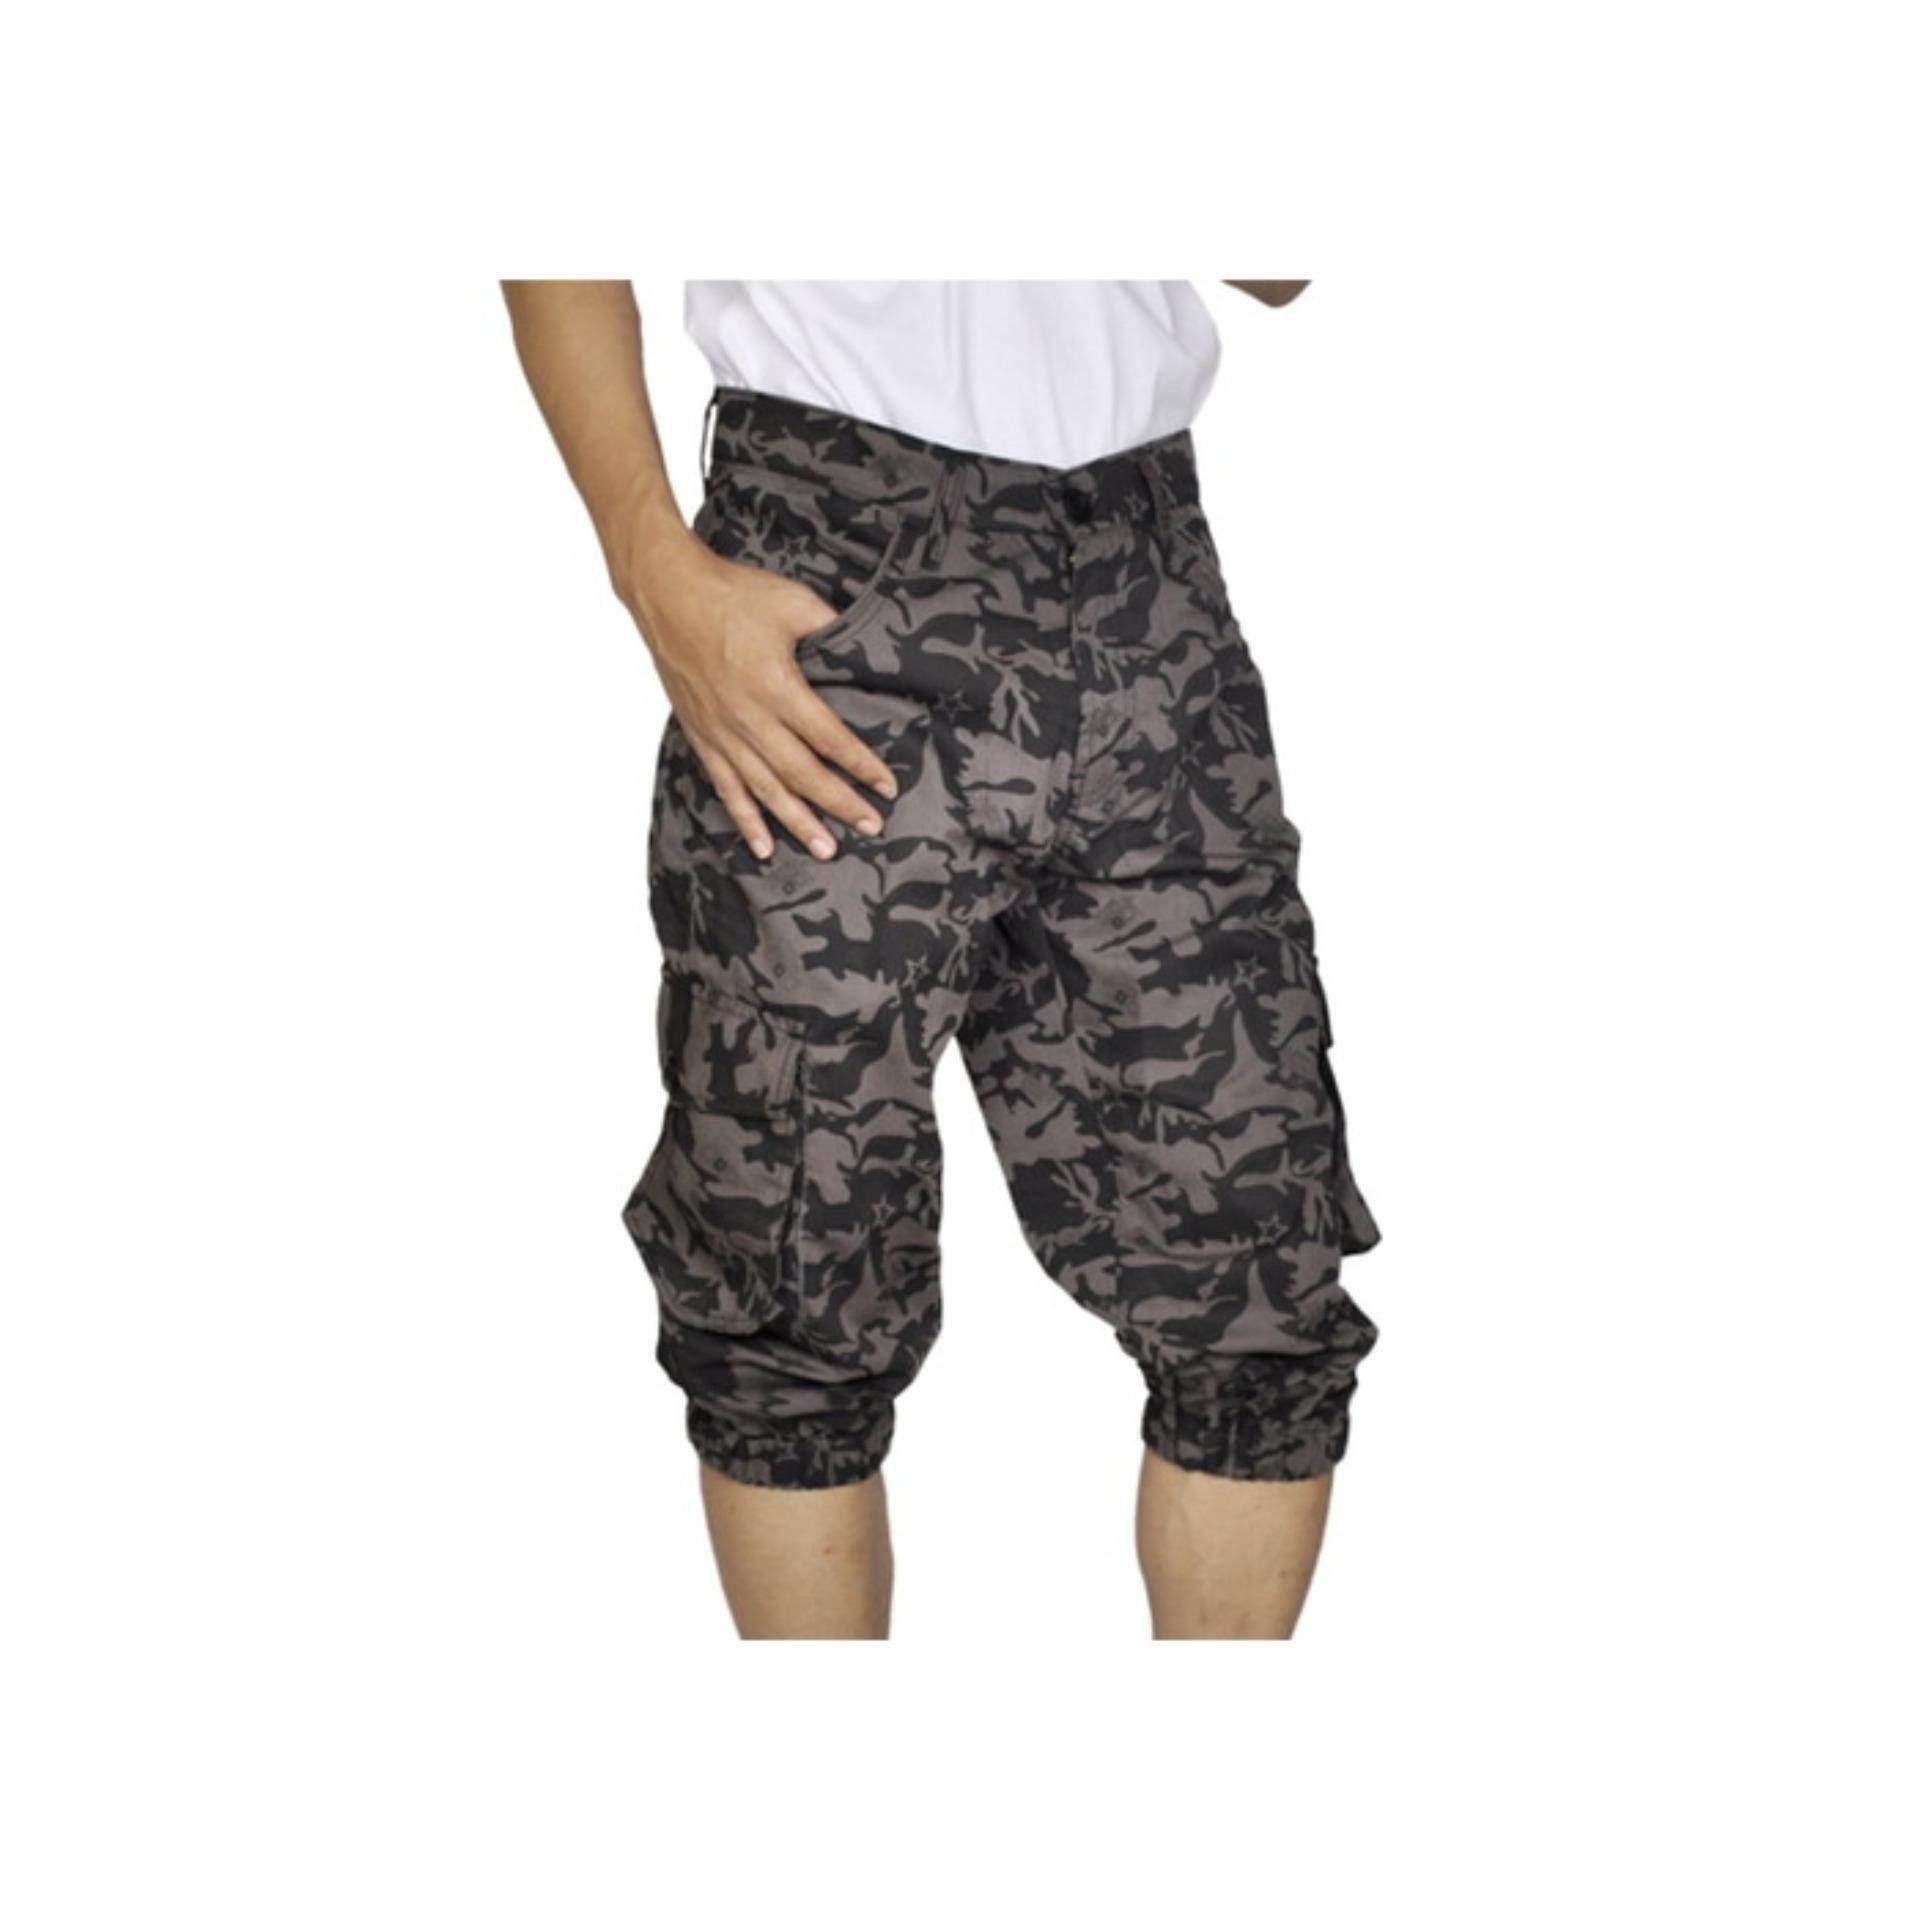 celana pendek pria / celana jogger army/ celana cargo army isl 208. Keren BAnget..!!!!